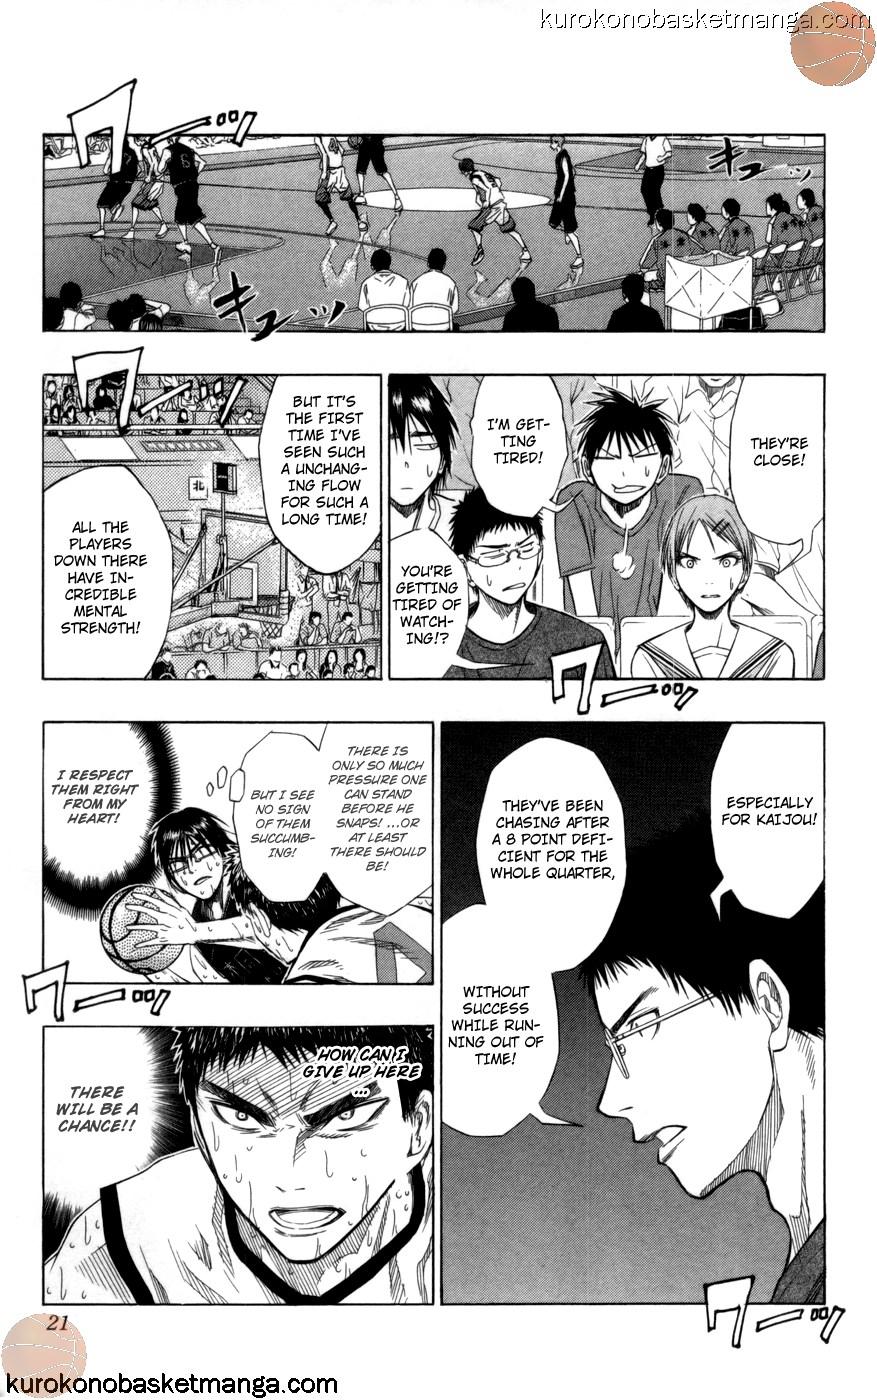 Kuroko no Basket Manga Chapter 71 - Image 18